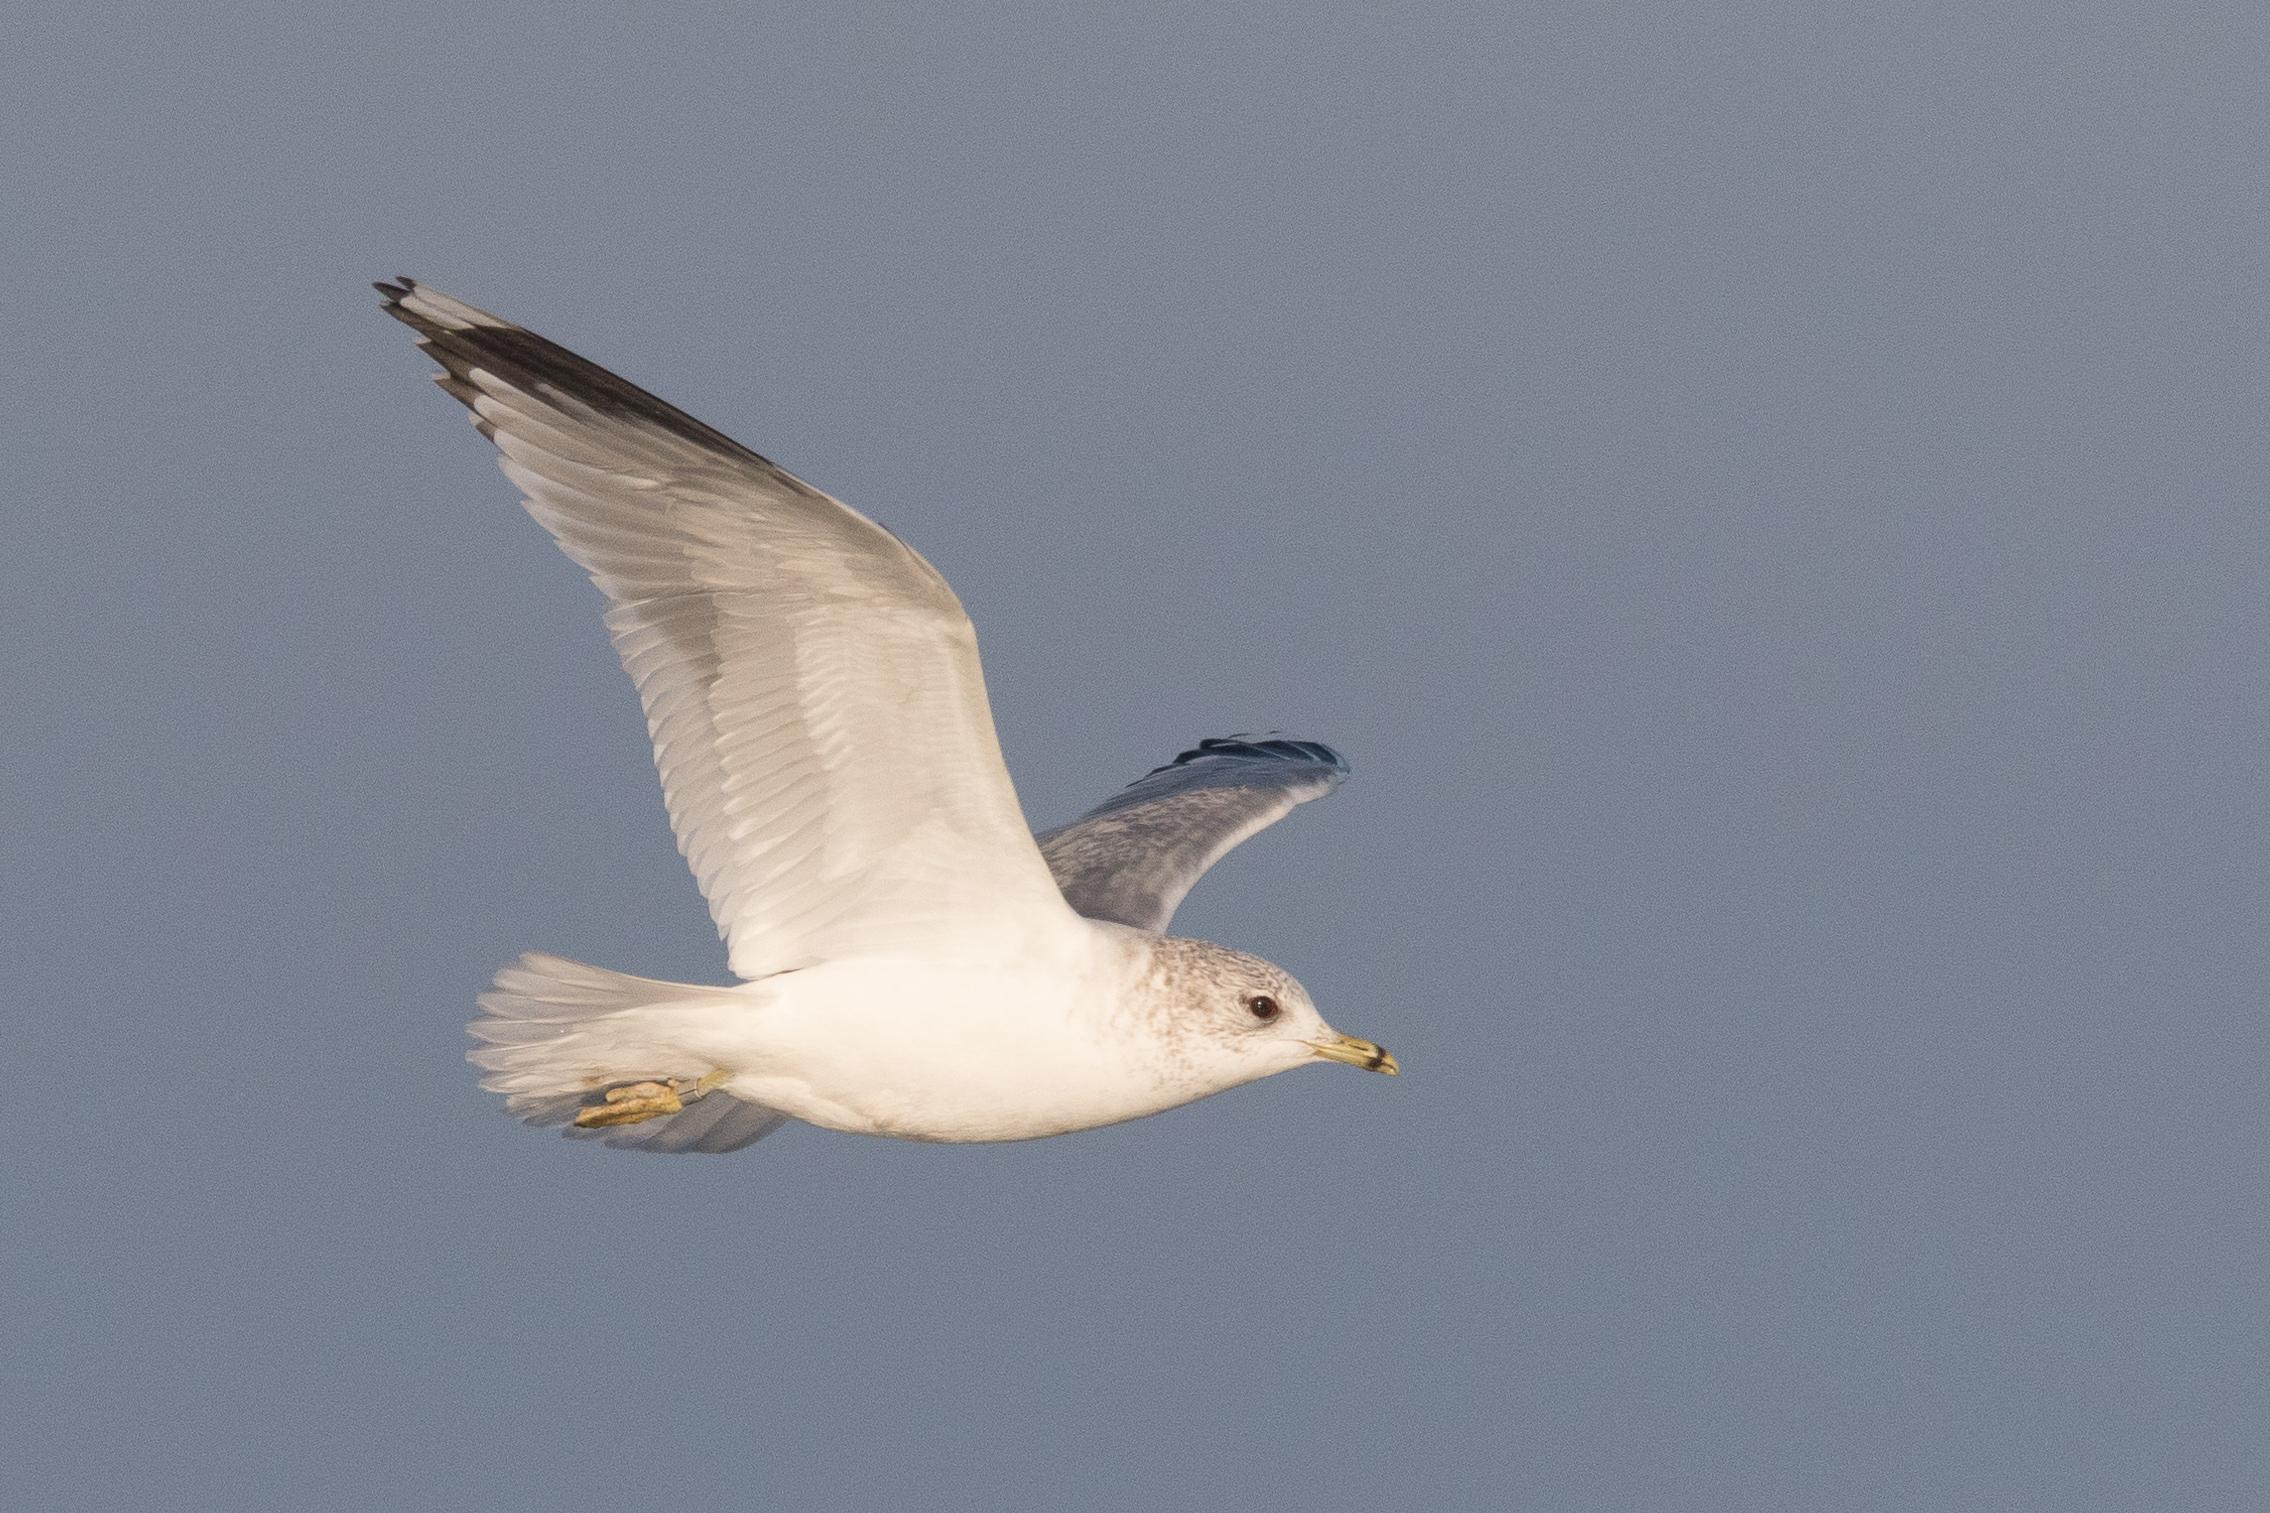 20170121-Common Gull Adult-08.jpg